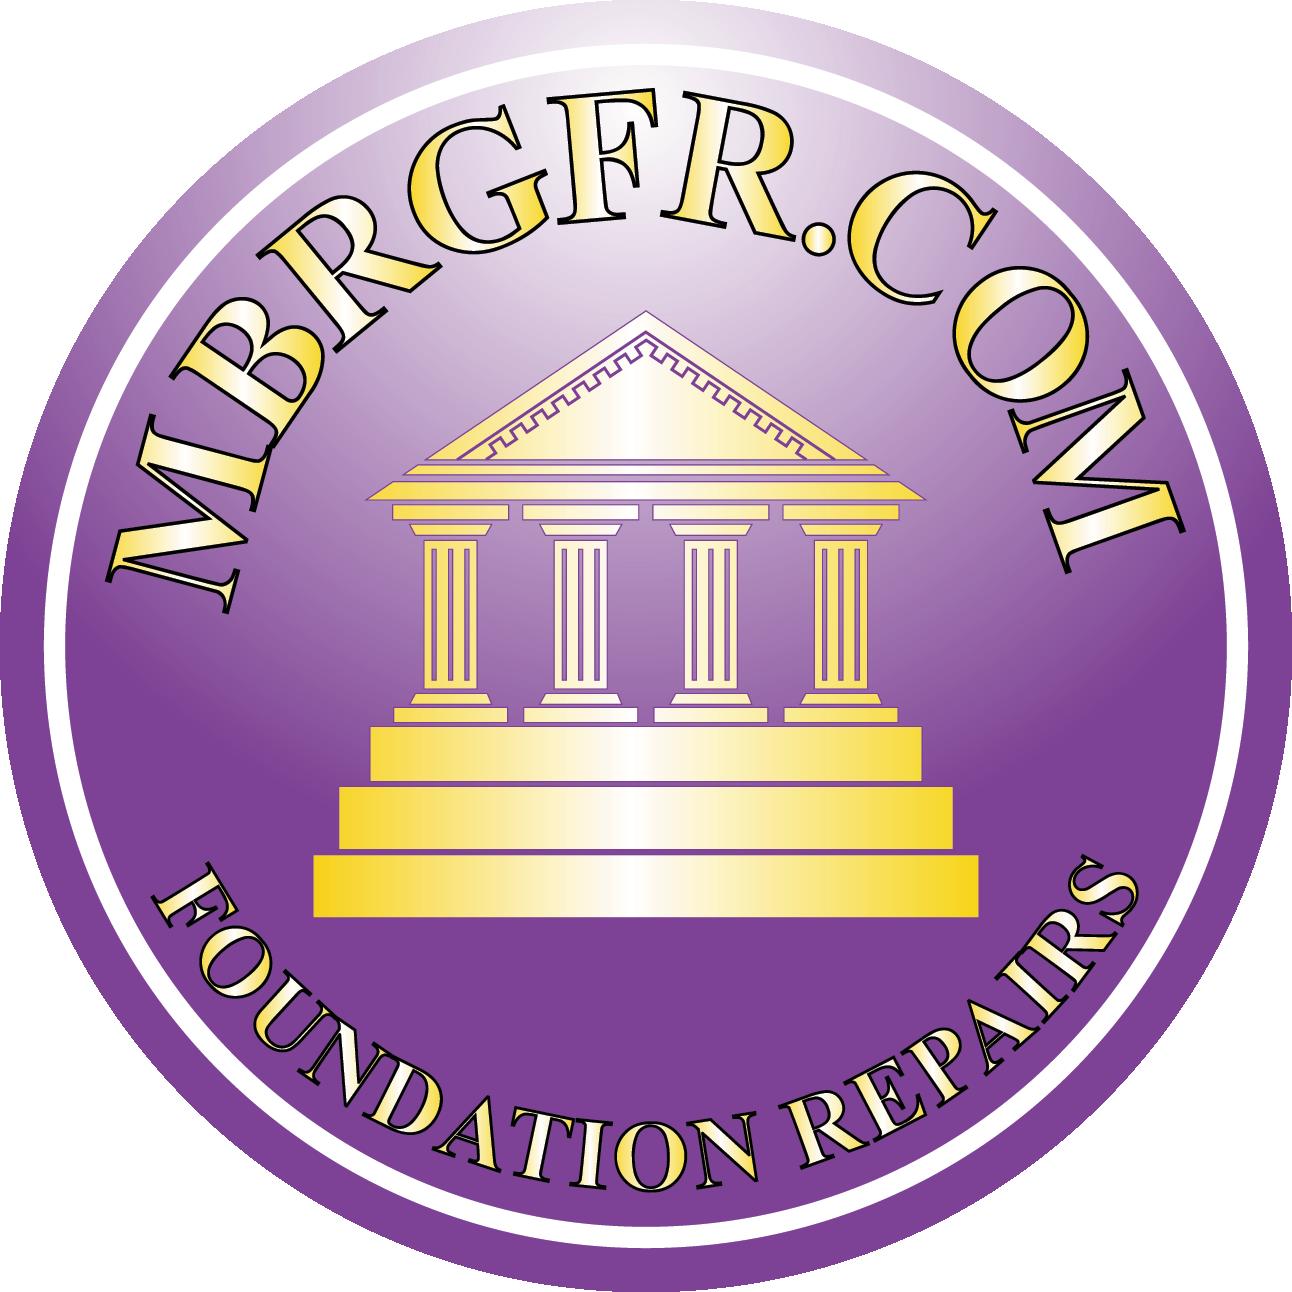 MBRGFR logo